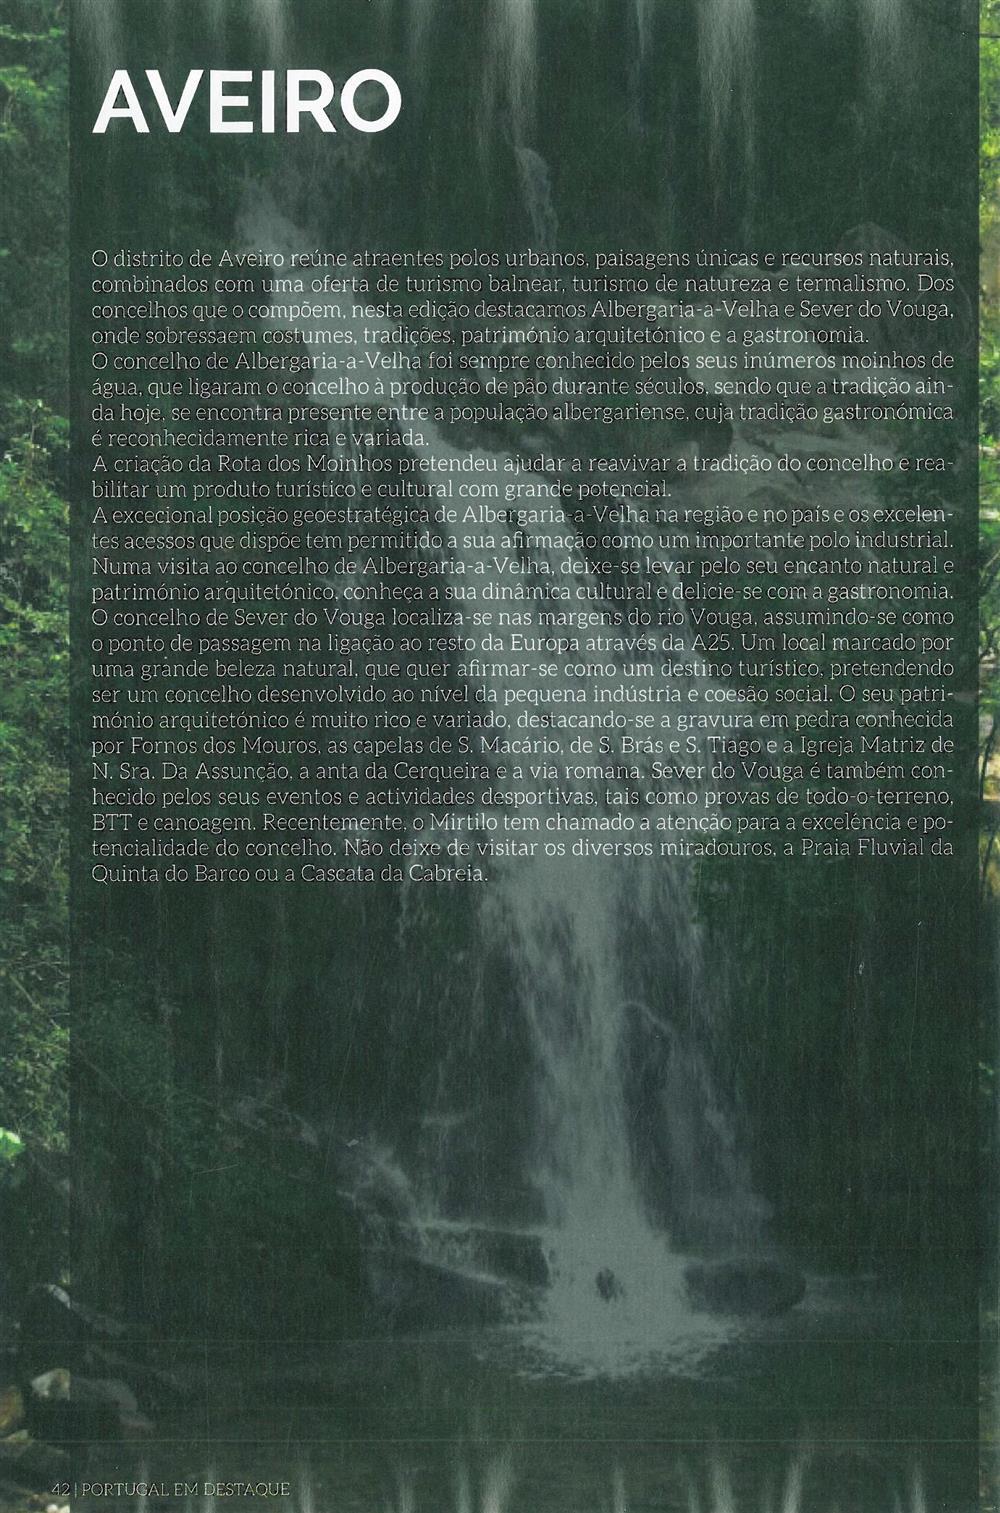 P.emD.-abr.'16-p.42-Aveiro.jpg